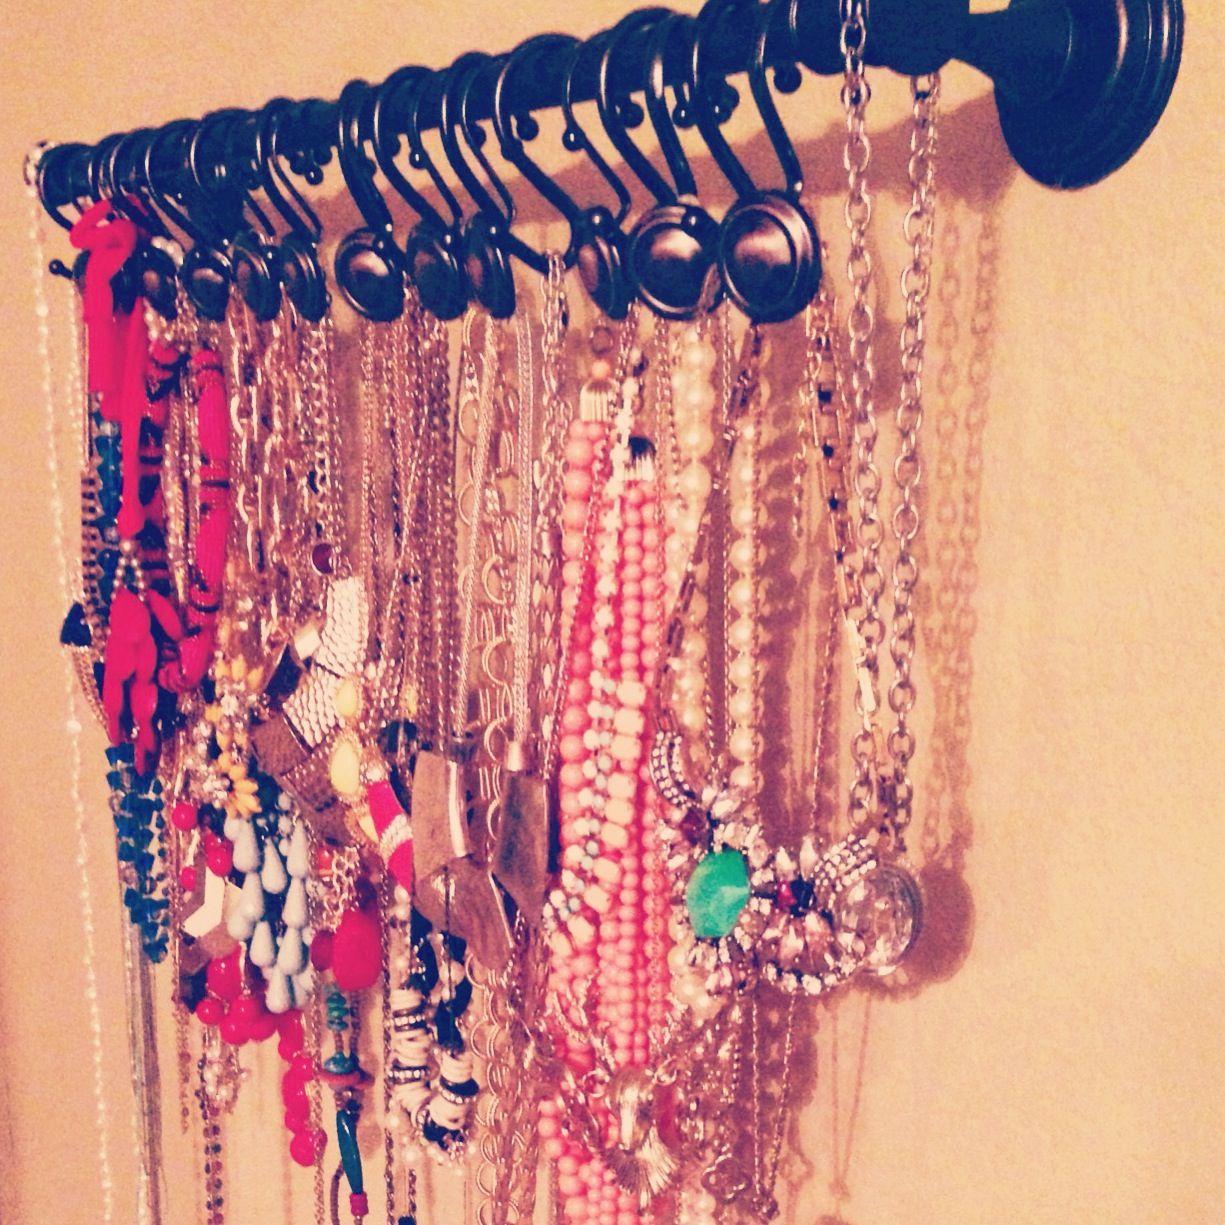 25 maneras de mantener tus joyas organizadas